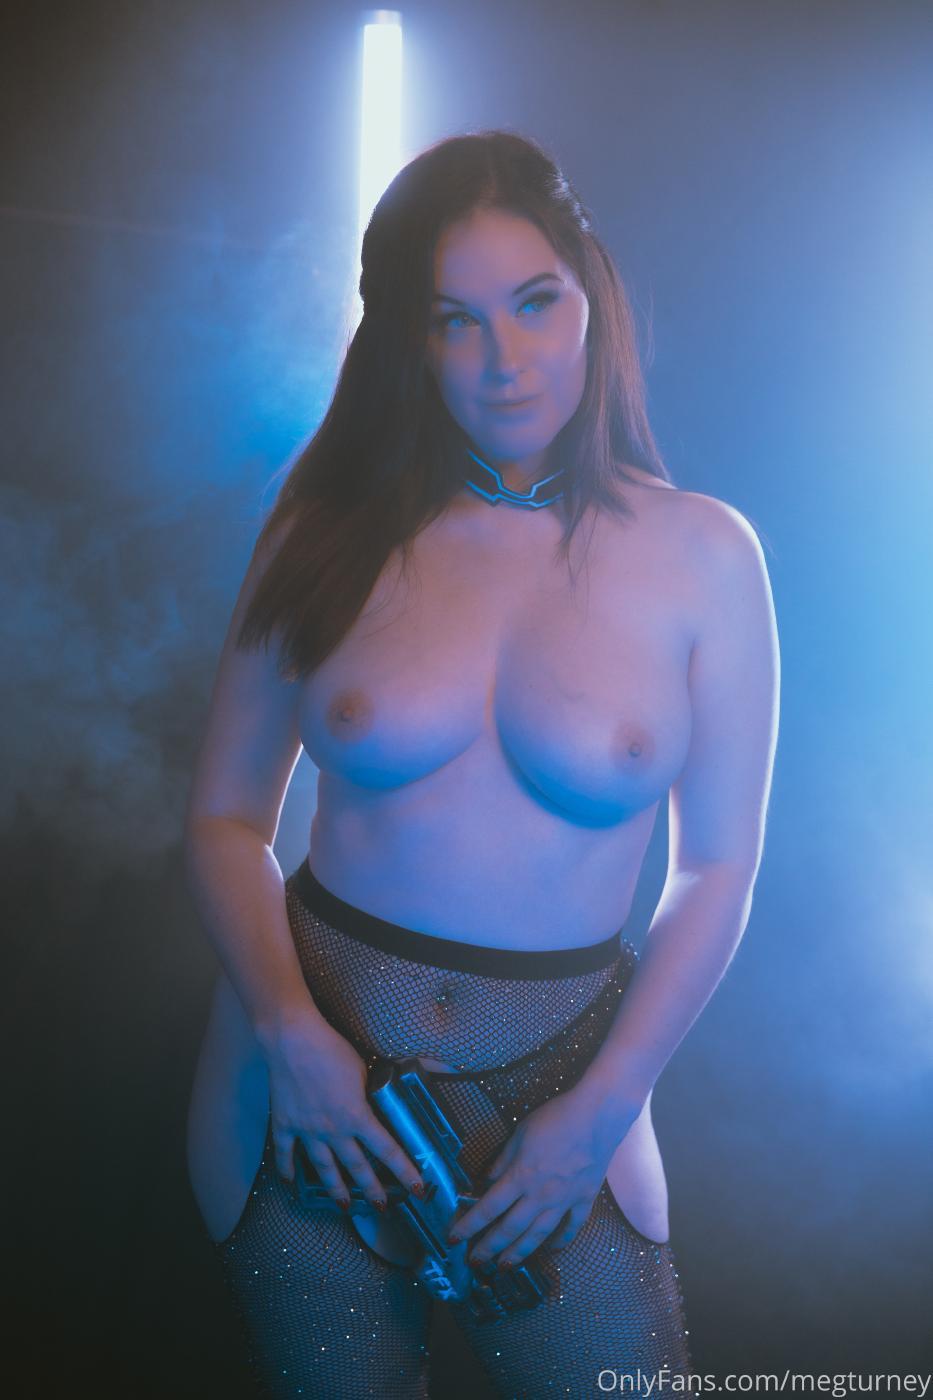 Meg Turney Nude Miranda Cosplay Onlyfans Set Leaked Mycujf